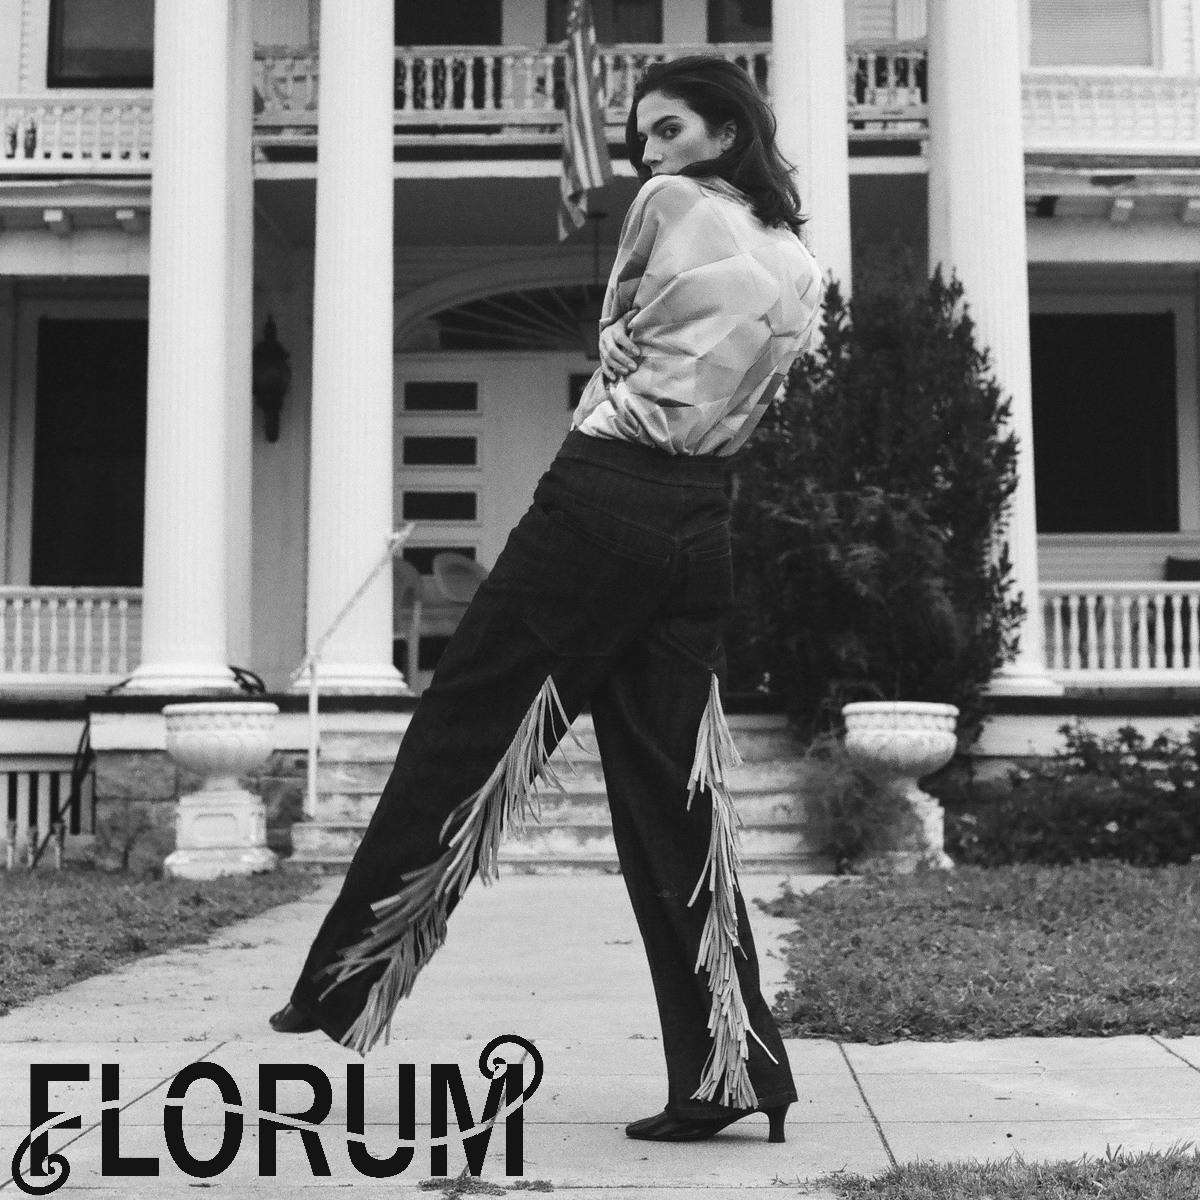 durabilité - Phlemuns - florum fashion magazine - mandi k smith - promise harvey - Kayla Gallagher Margaux Models LA - Sustainble - Slow Fashion Movement